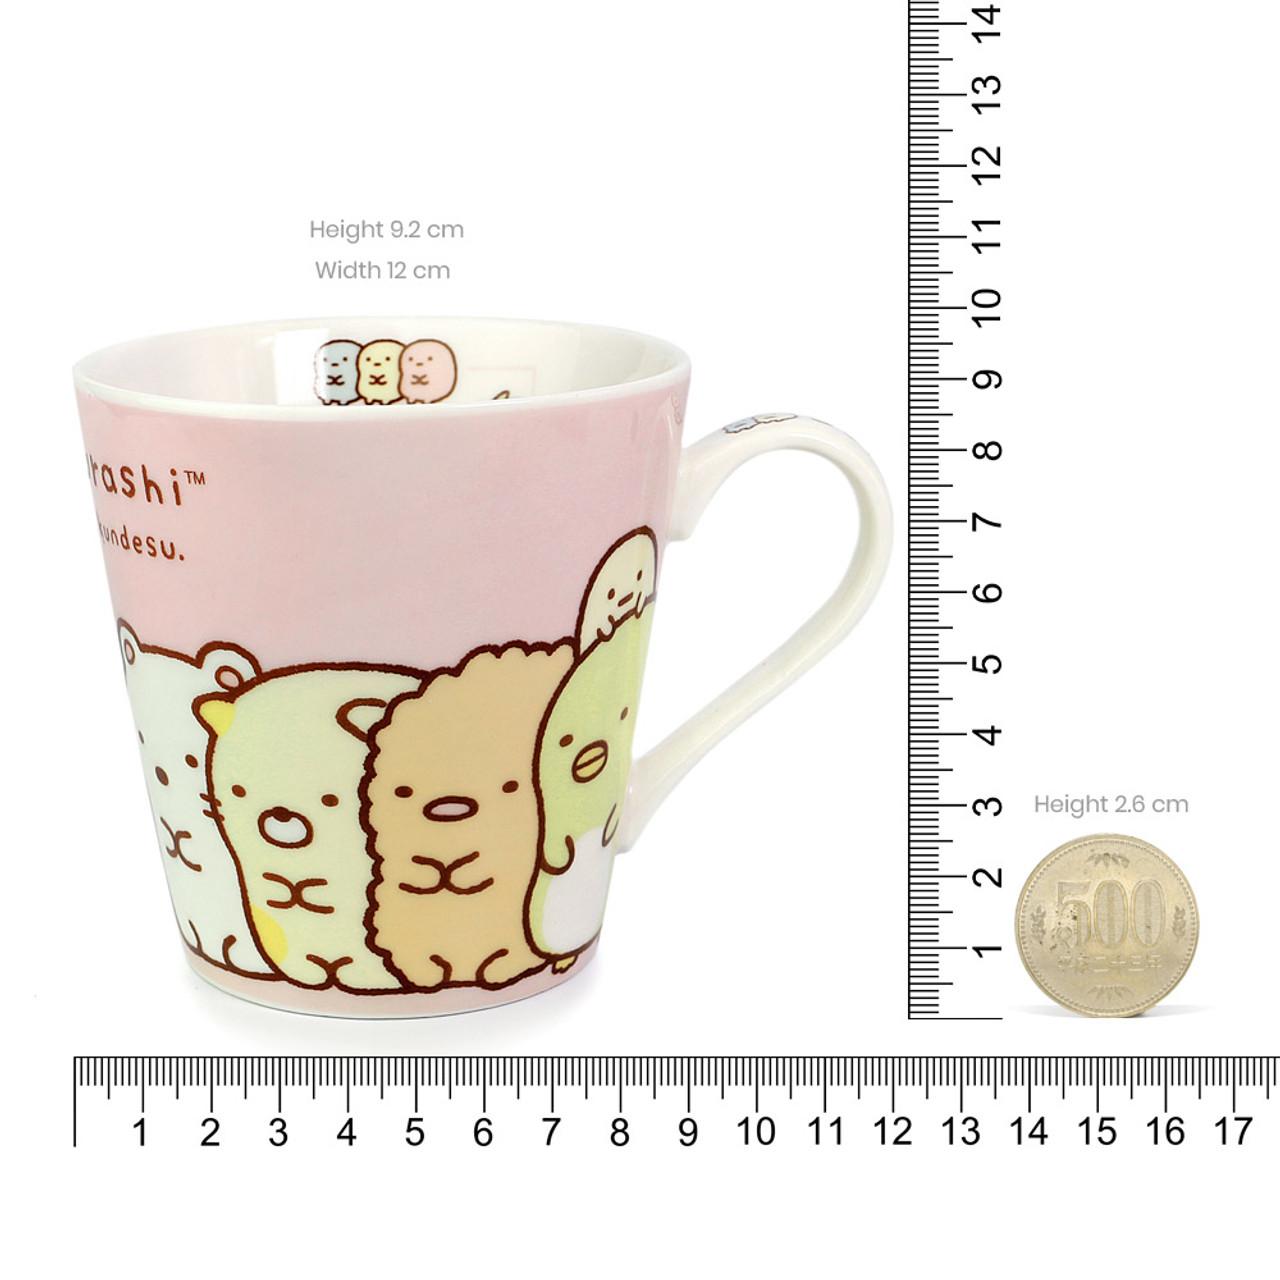 Sumikko Gurashi Measure Ceramic Mug - Horizontal ( Proportion )